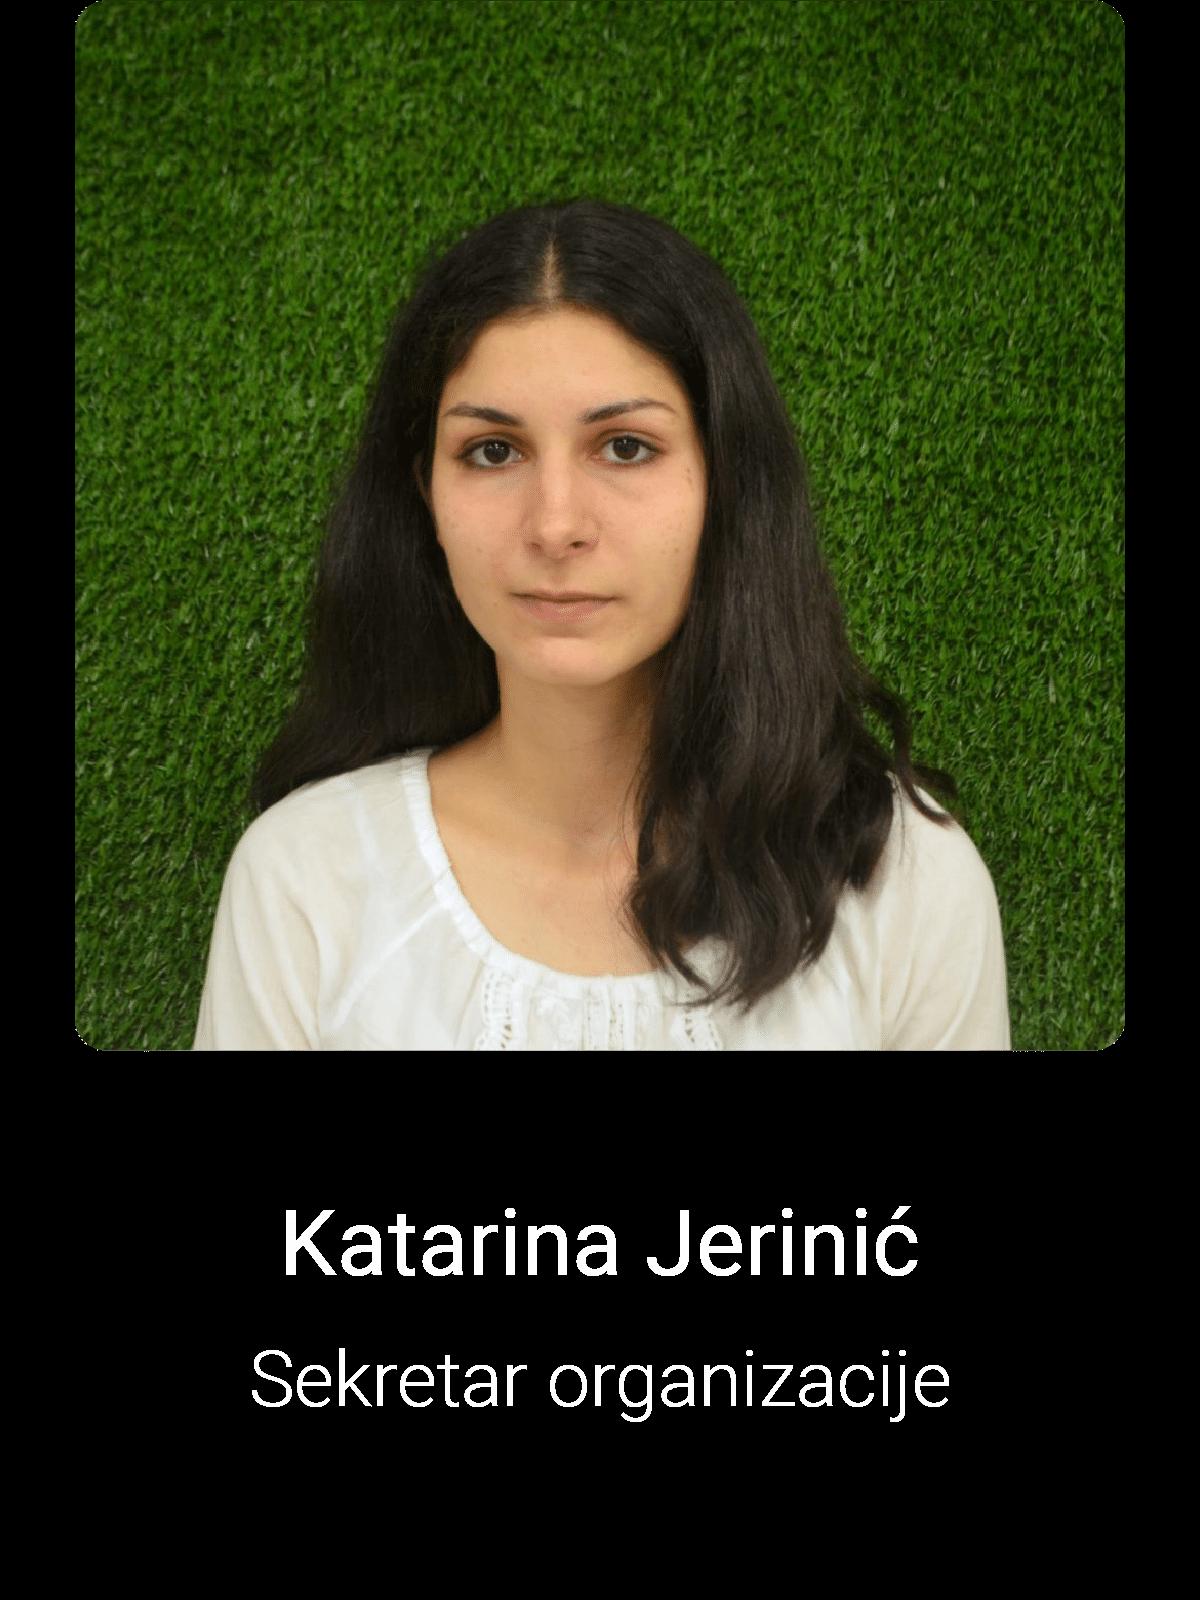 Katarina Jerinić